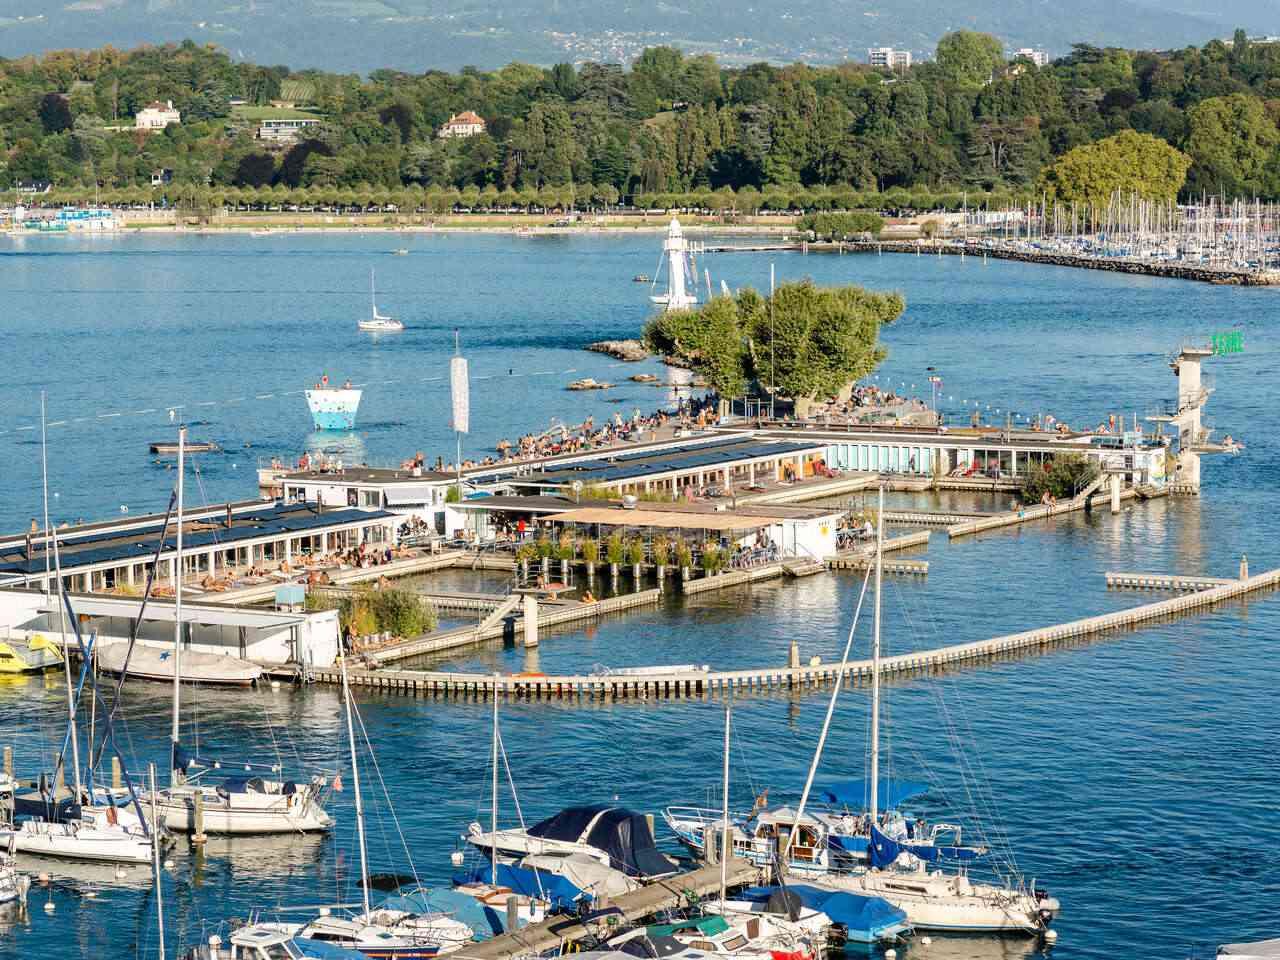 Aerial view of Bain des Paquis lake recreation center